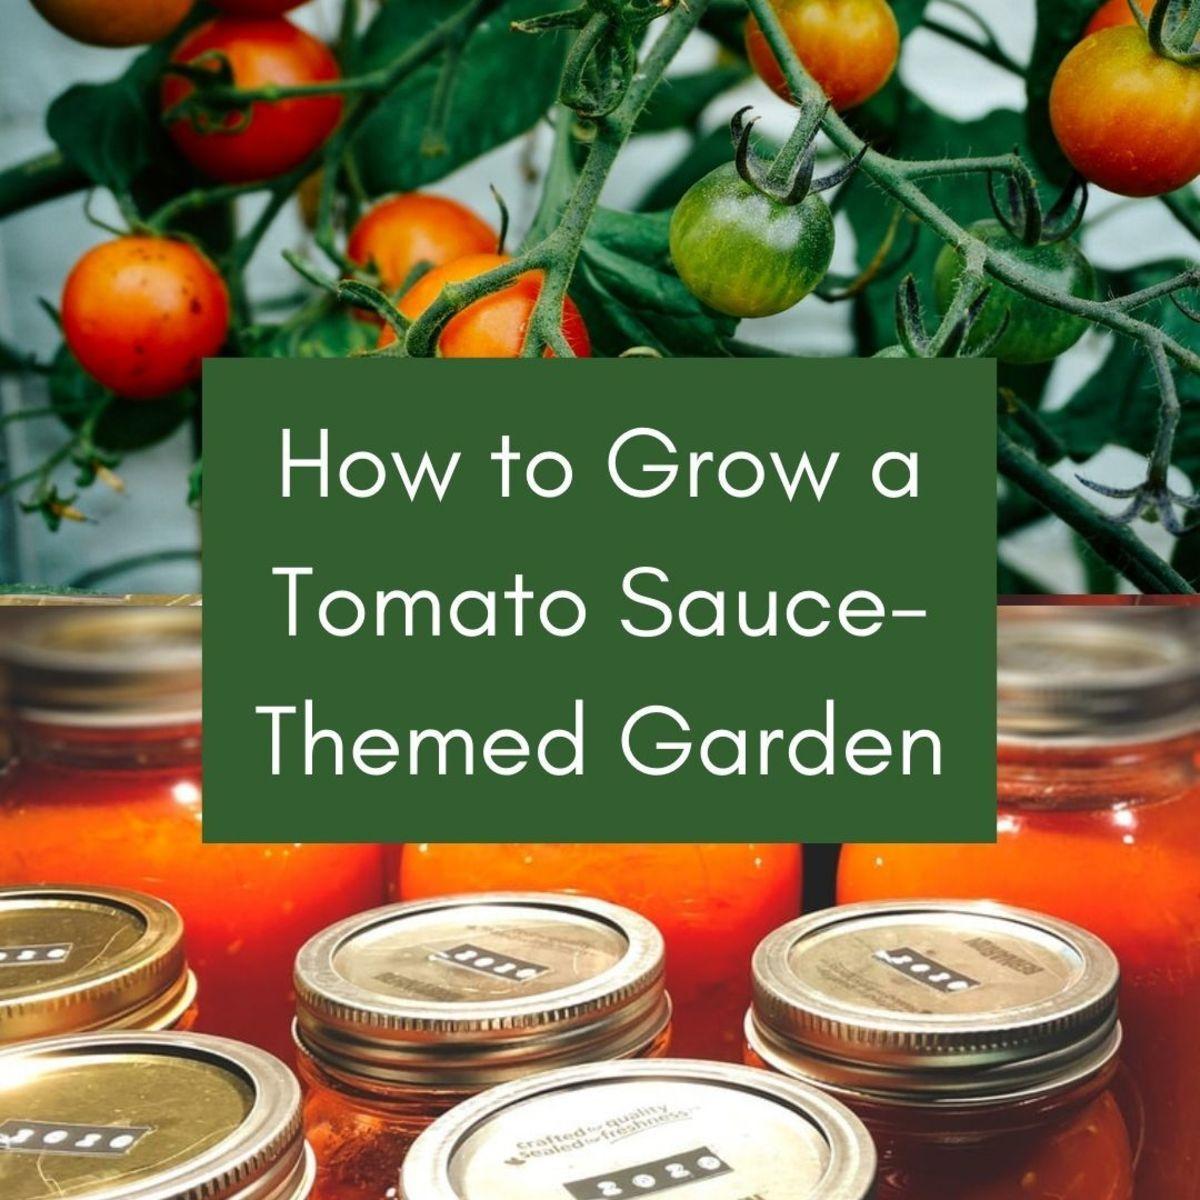 grow-a-spaghetti-sauce-theme-garden-in-a-4x-4-raised-bed